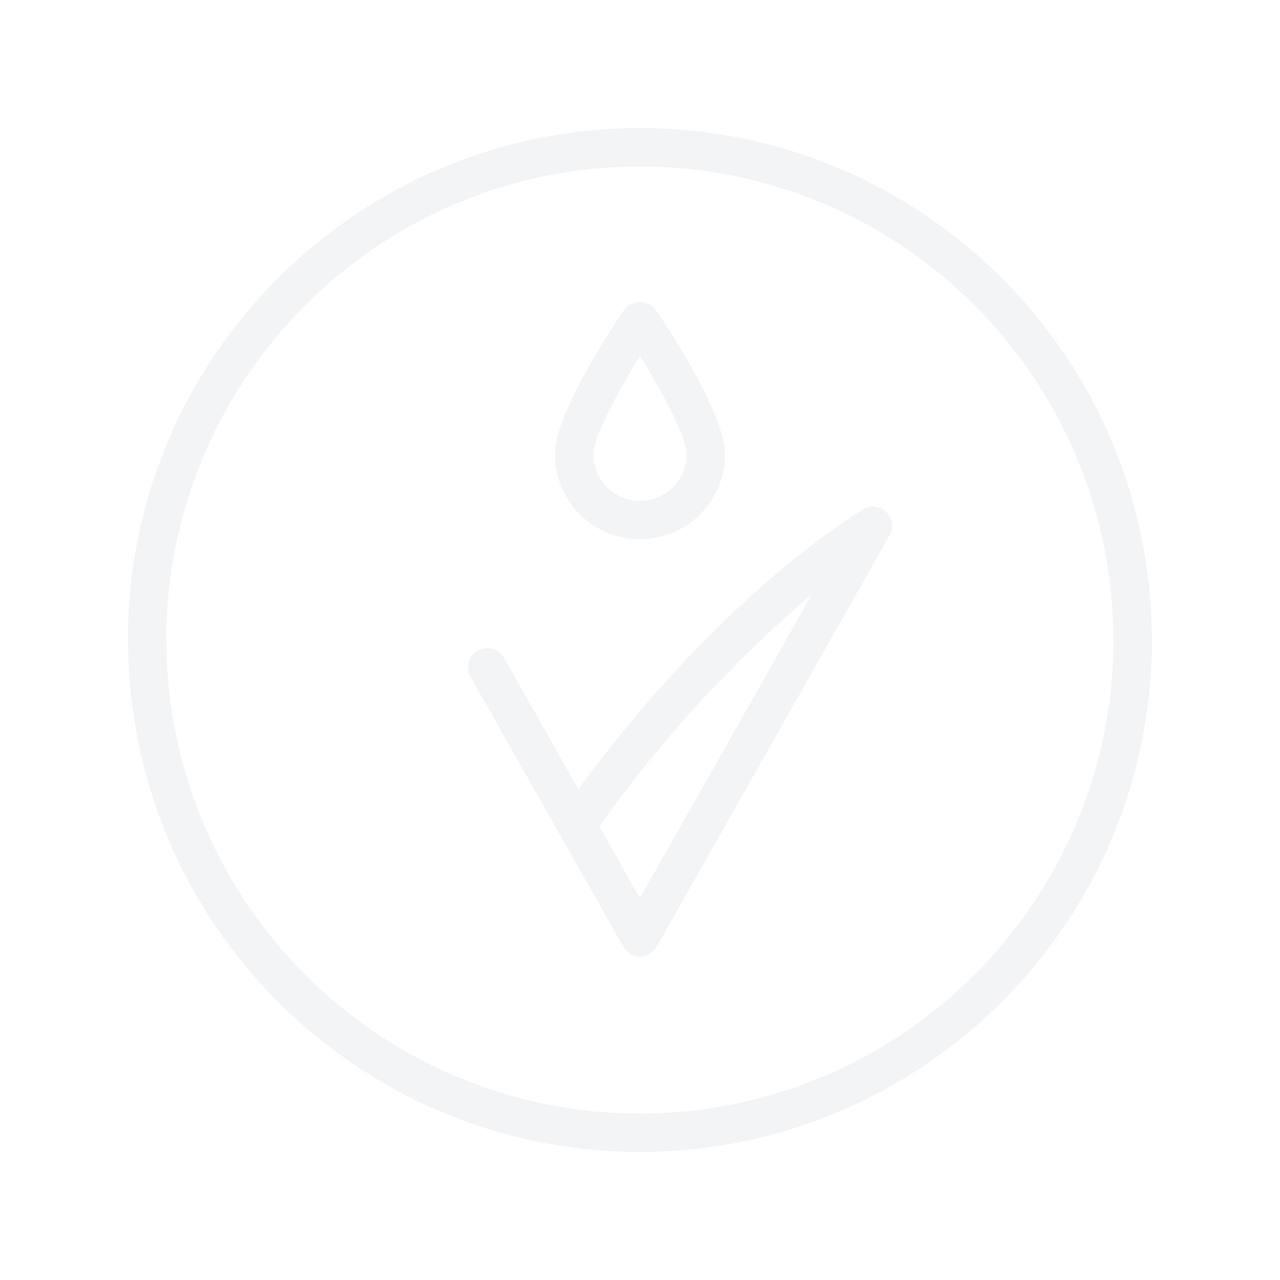 GOLDWELL Kerasilk Color Gentle Dry Shampoo сухой шампунь для окрашенных волос 200ml